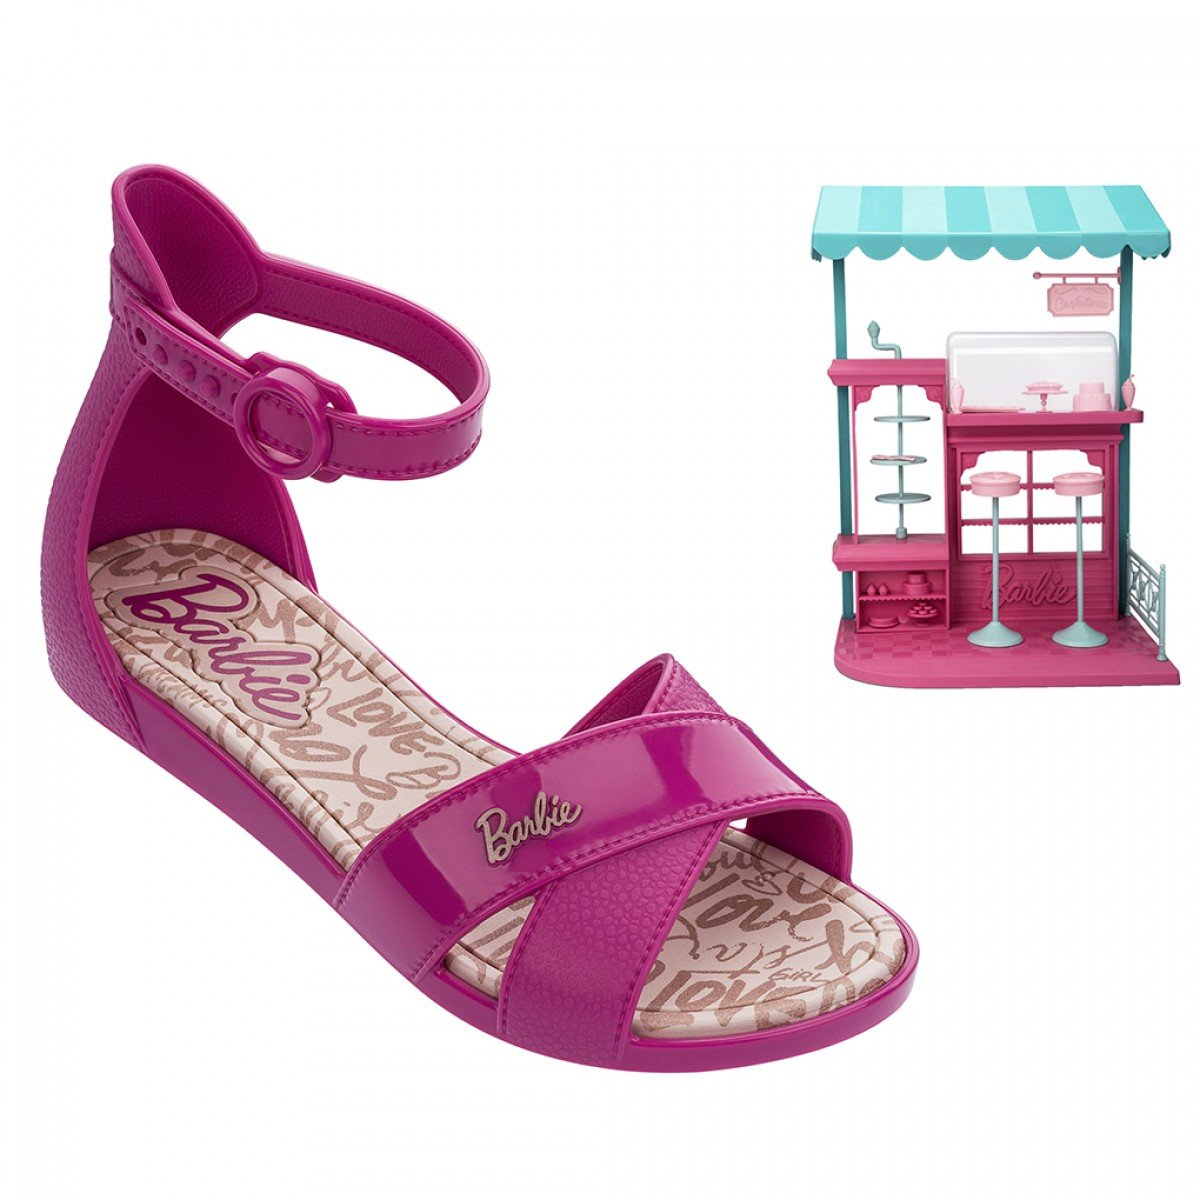 45934c406f Sandália Barabie Grendene Confeitaria Infantil Rosa Pink - Compre ...